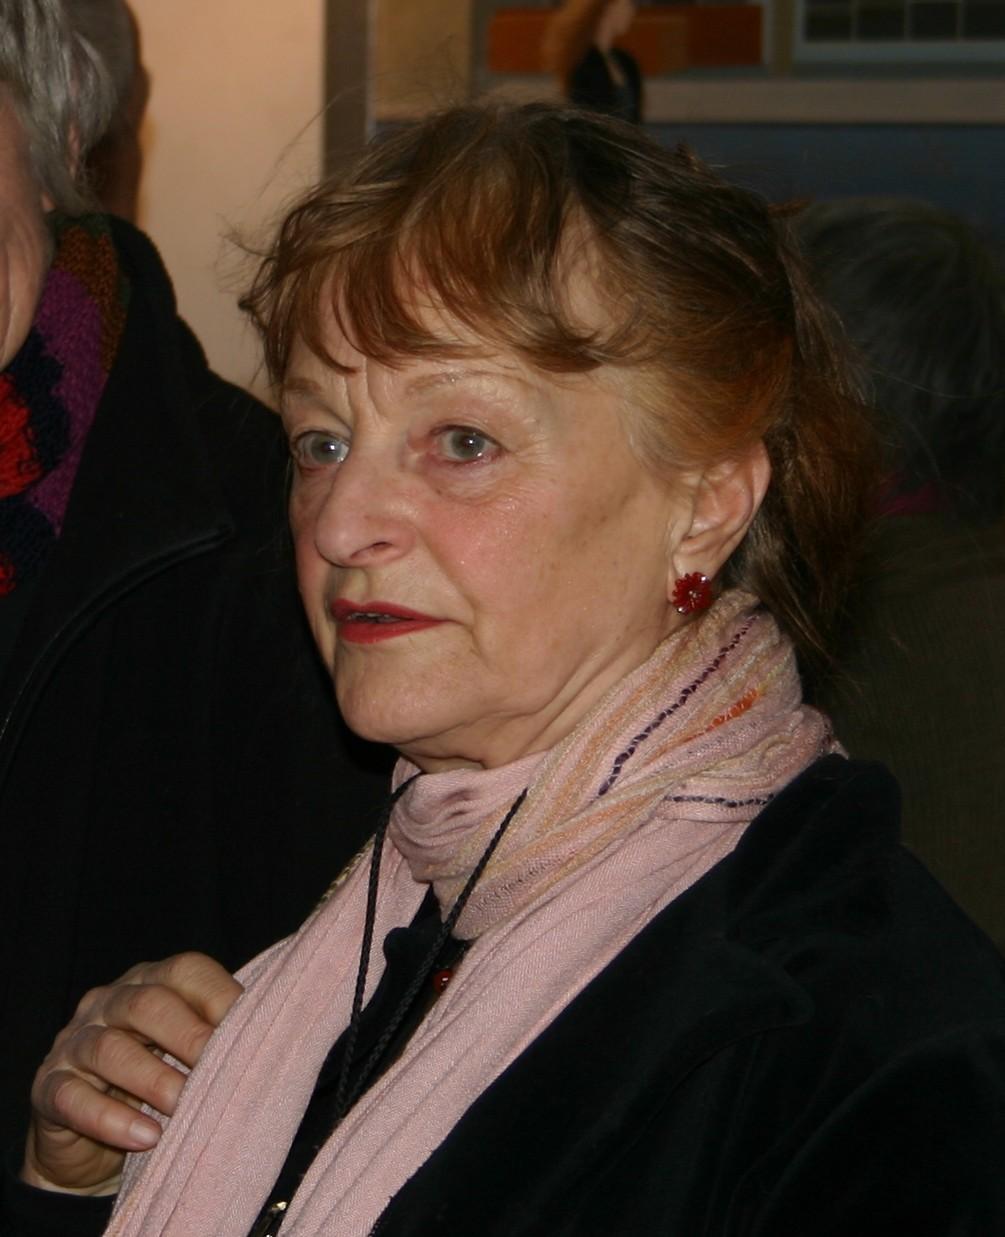 Image of Helga Paris from Wikidata